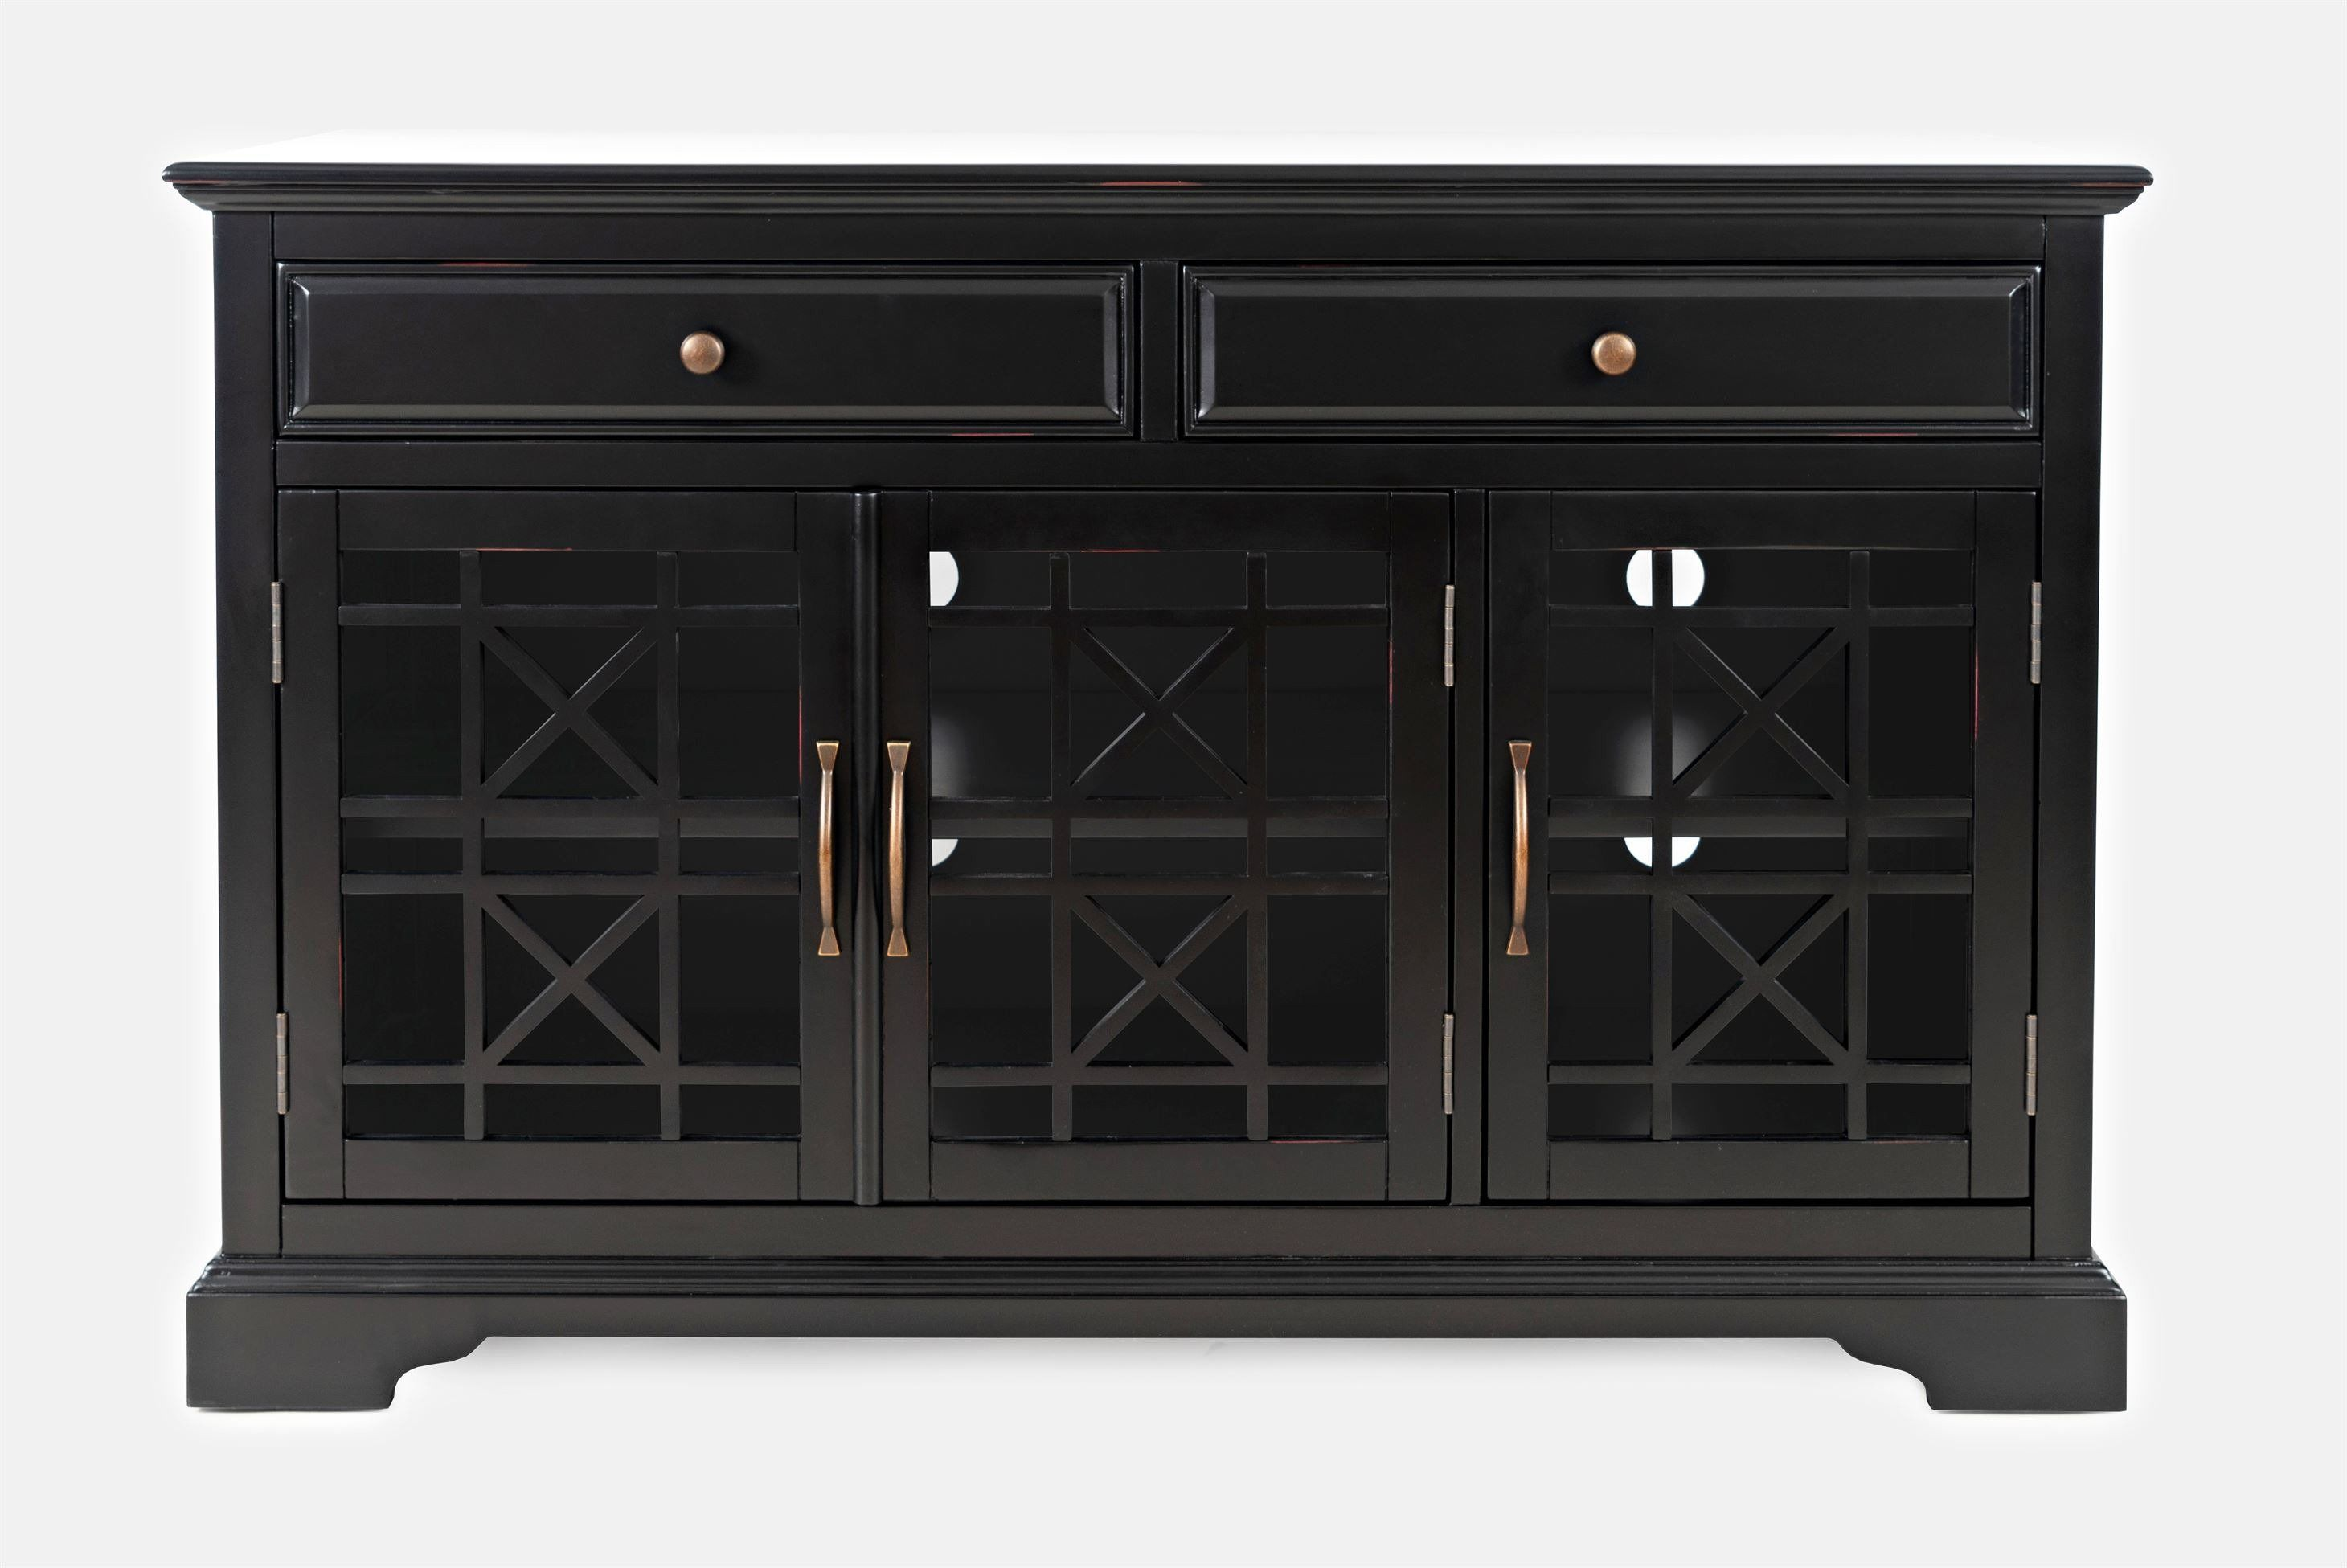 AV275-50 Komoda 3D/2S Avola Antique Black